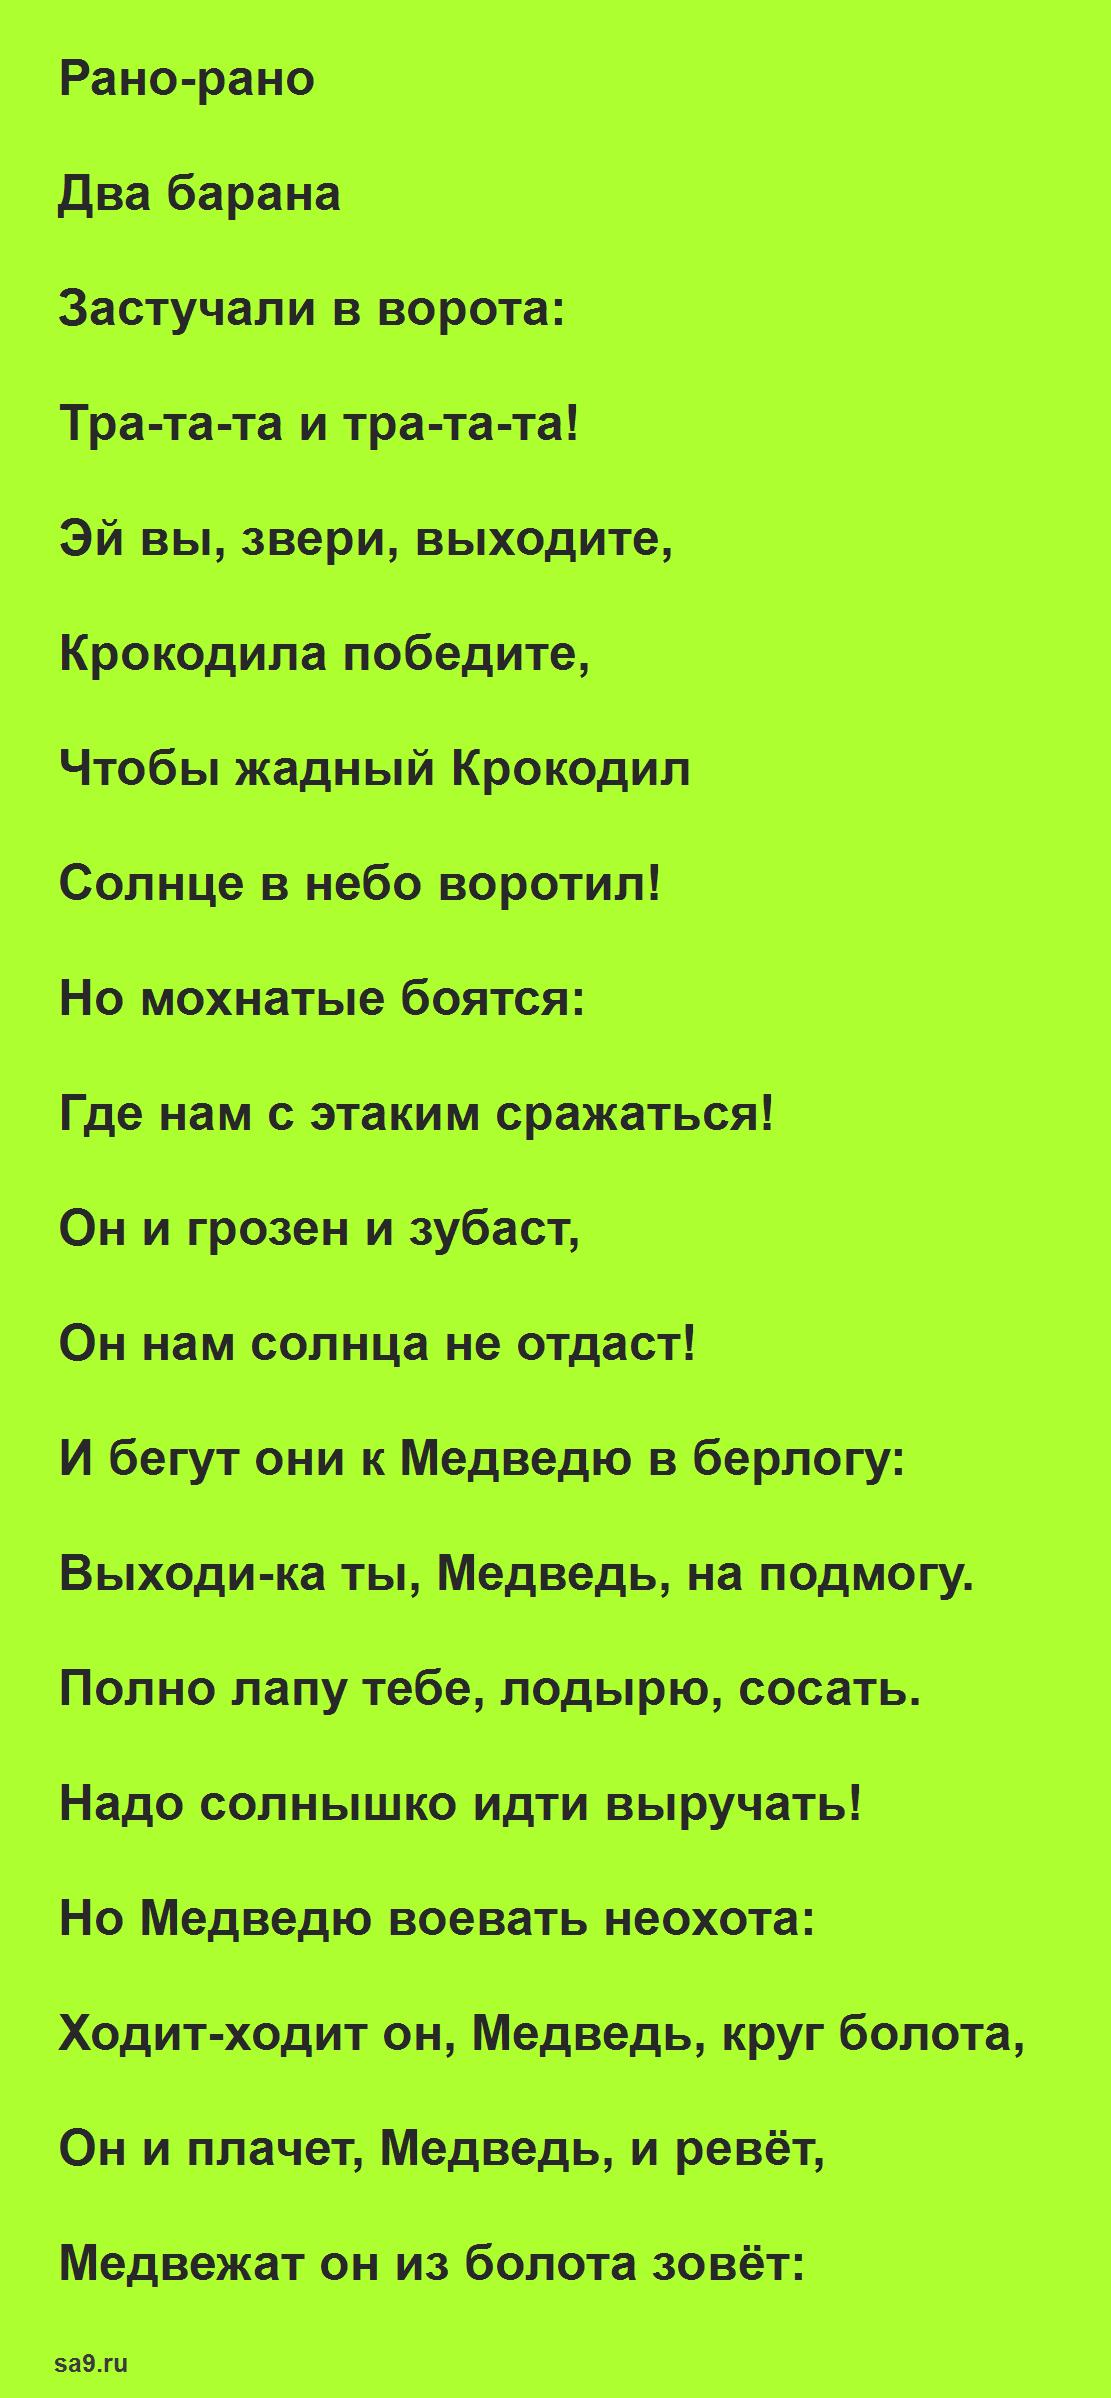 Сказка 'Краденое солнце', Чуковский